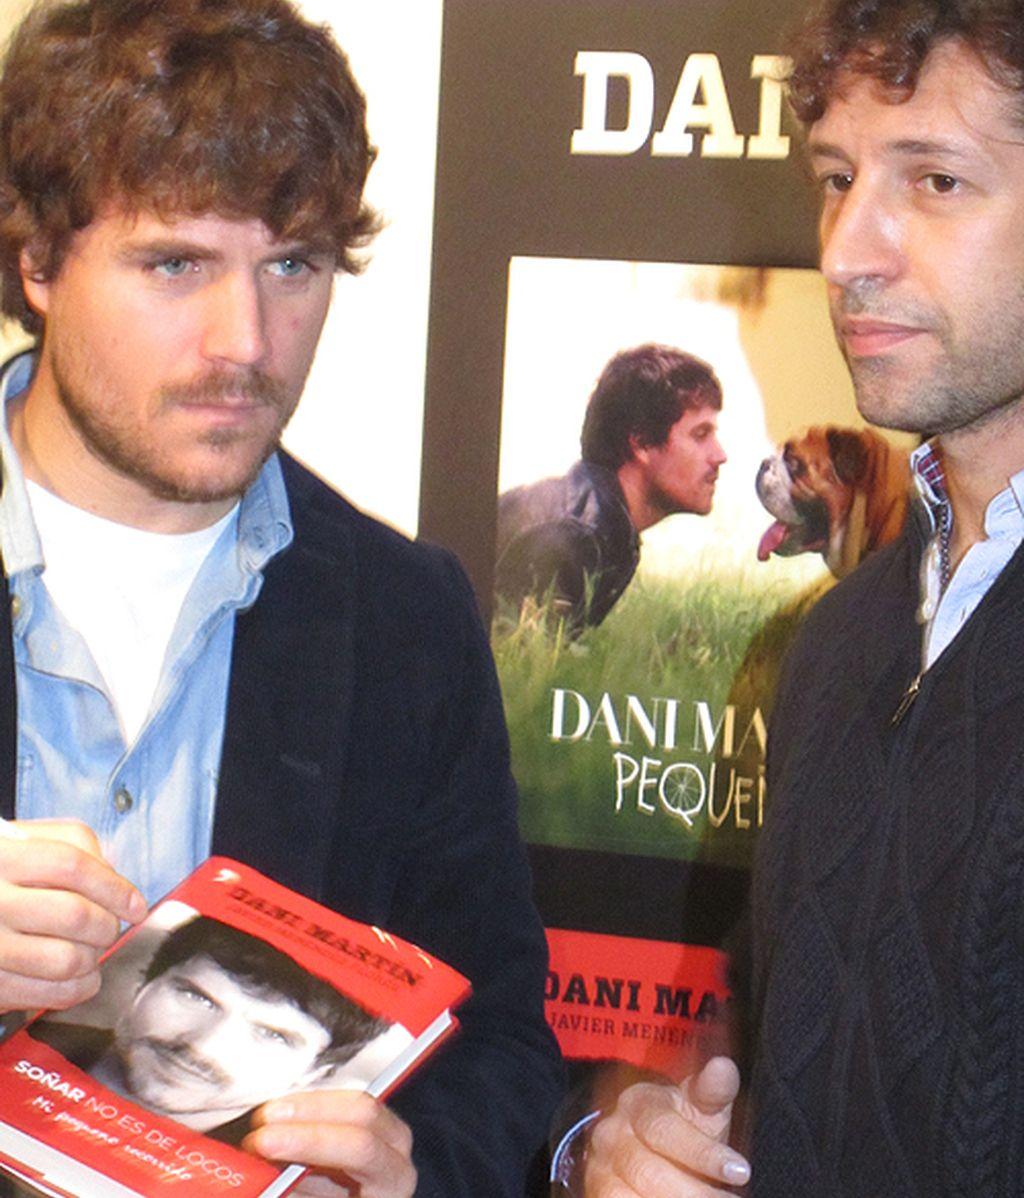 Dani Martín, hijo doble platino